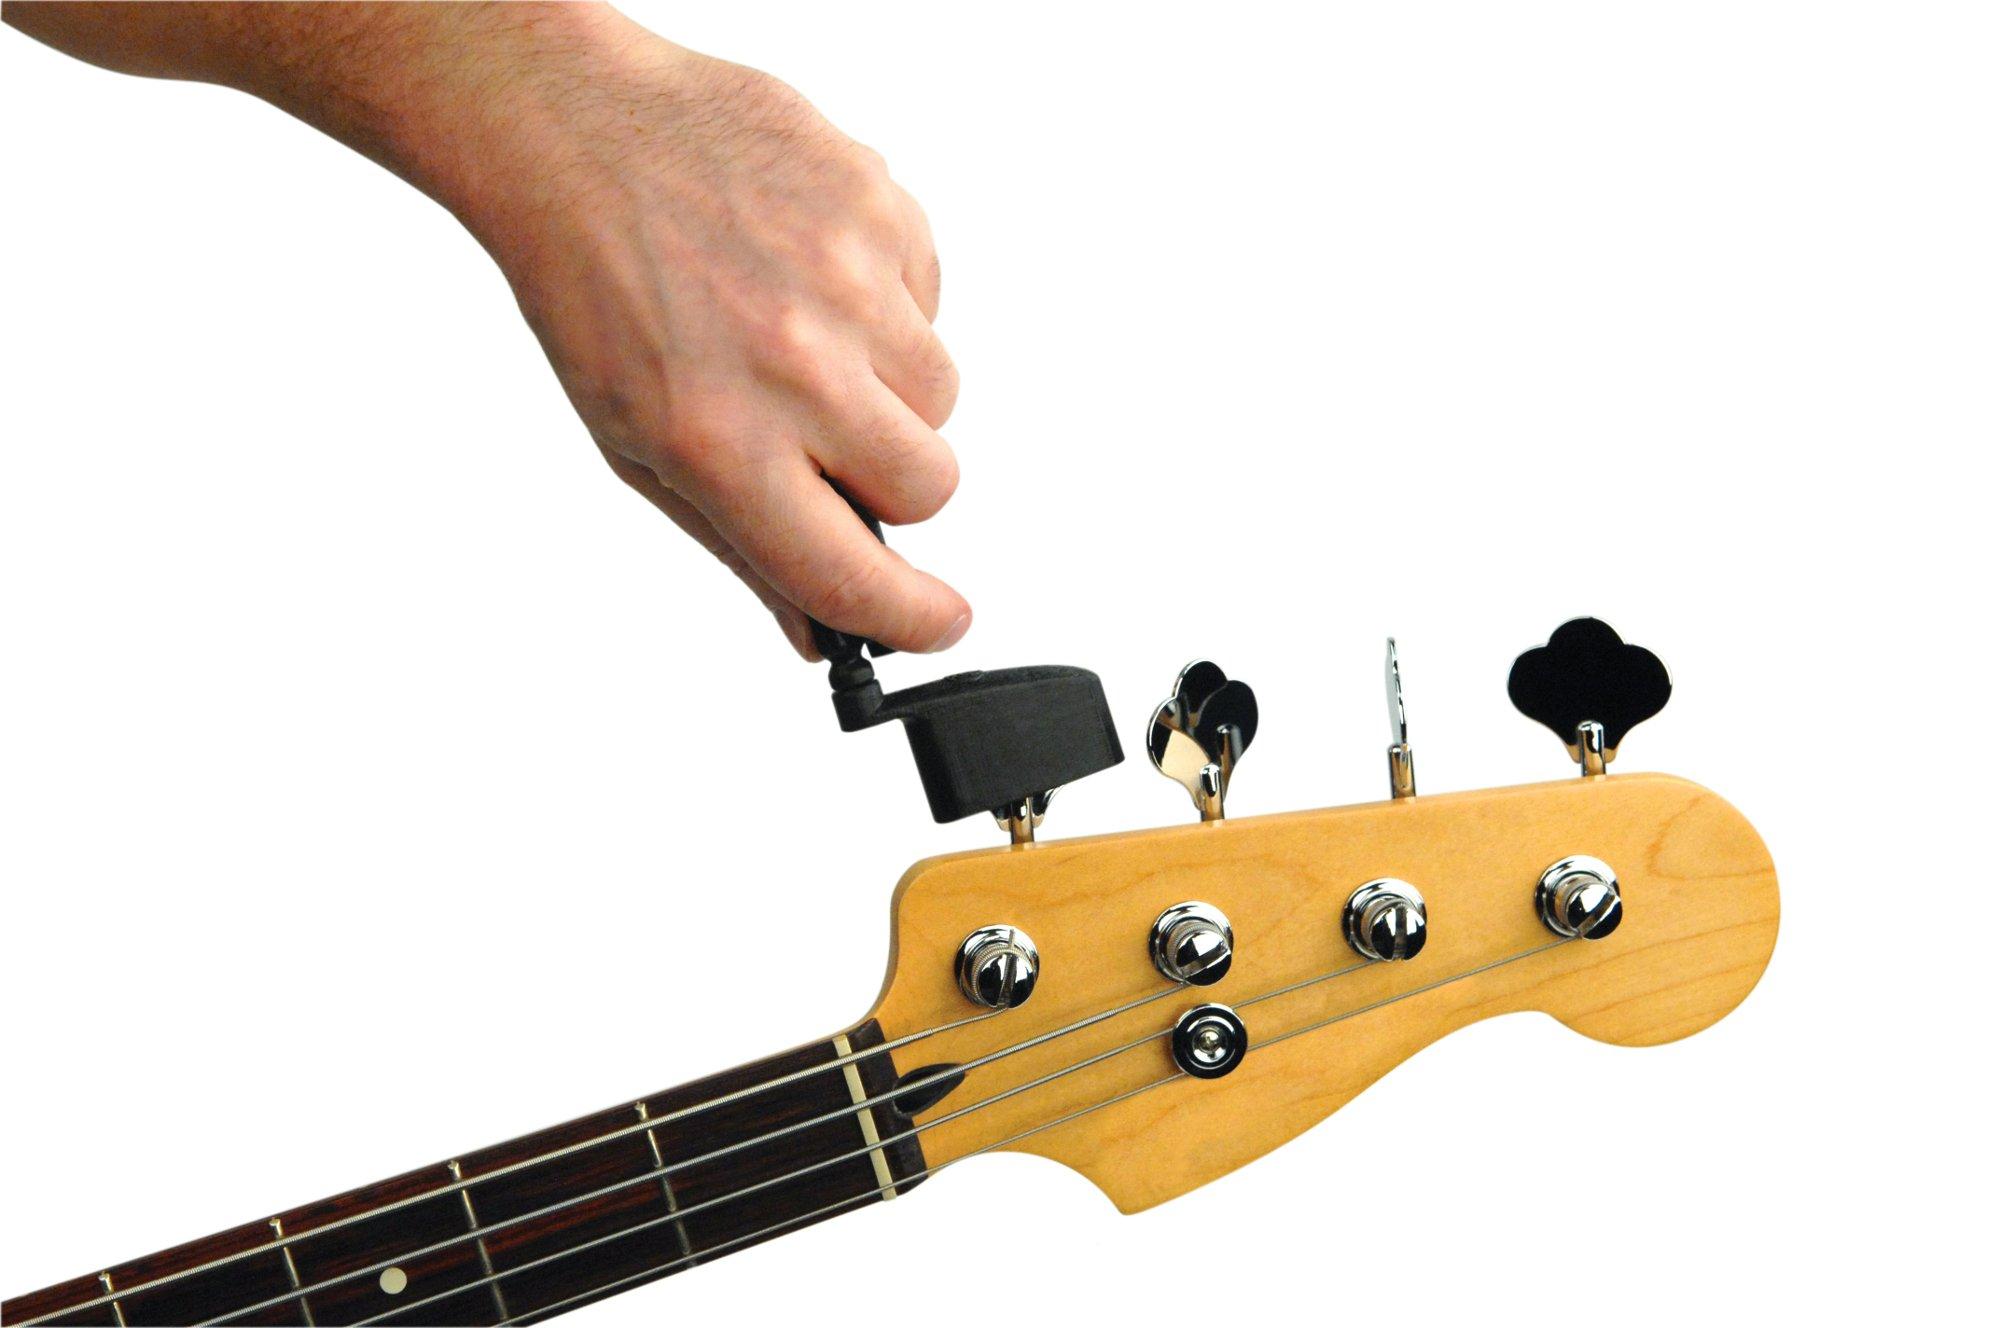 planet waves pro winder string winder cutter for bass guitars full compass. Black Bedroom Furniture Sets. Home Design Ideas